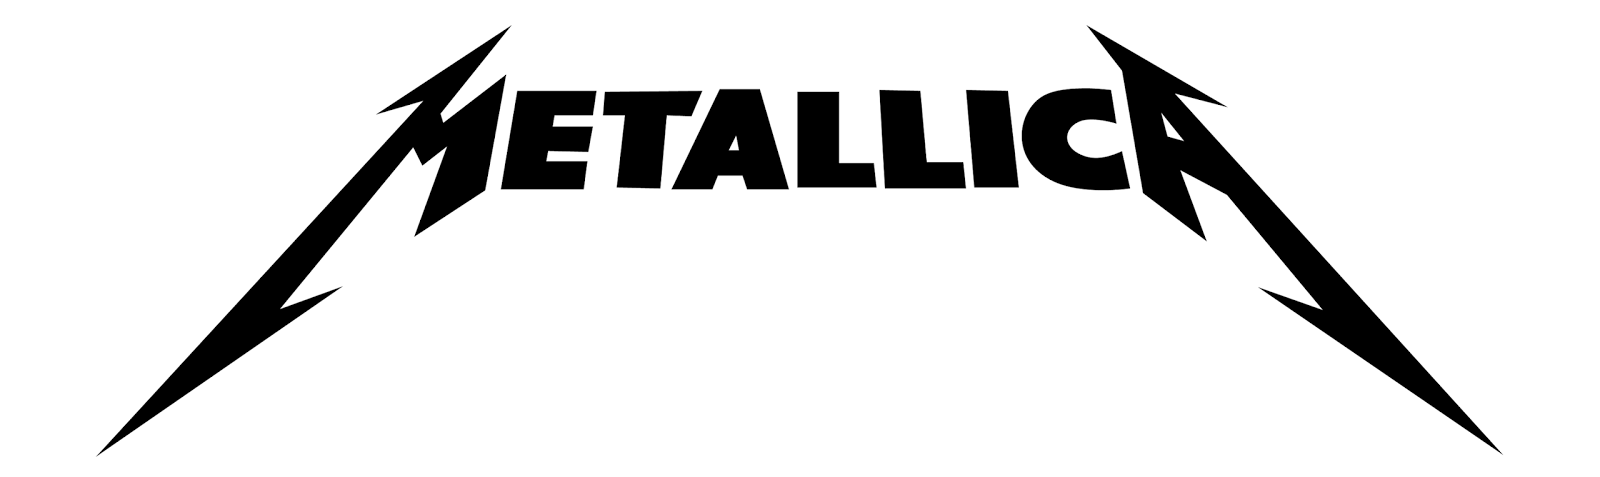 metallica_logo_by_dutchlion-d4 ...